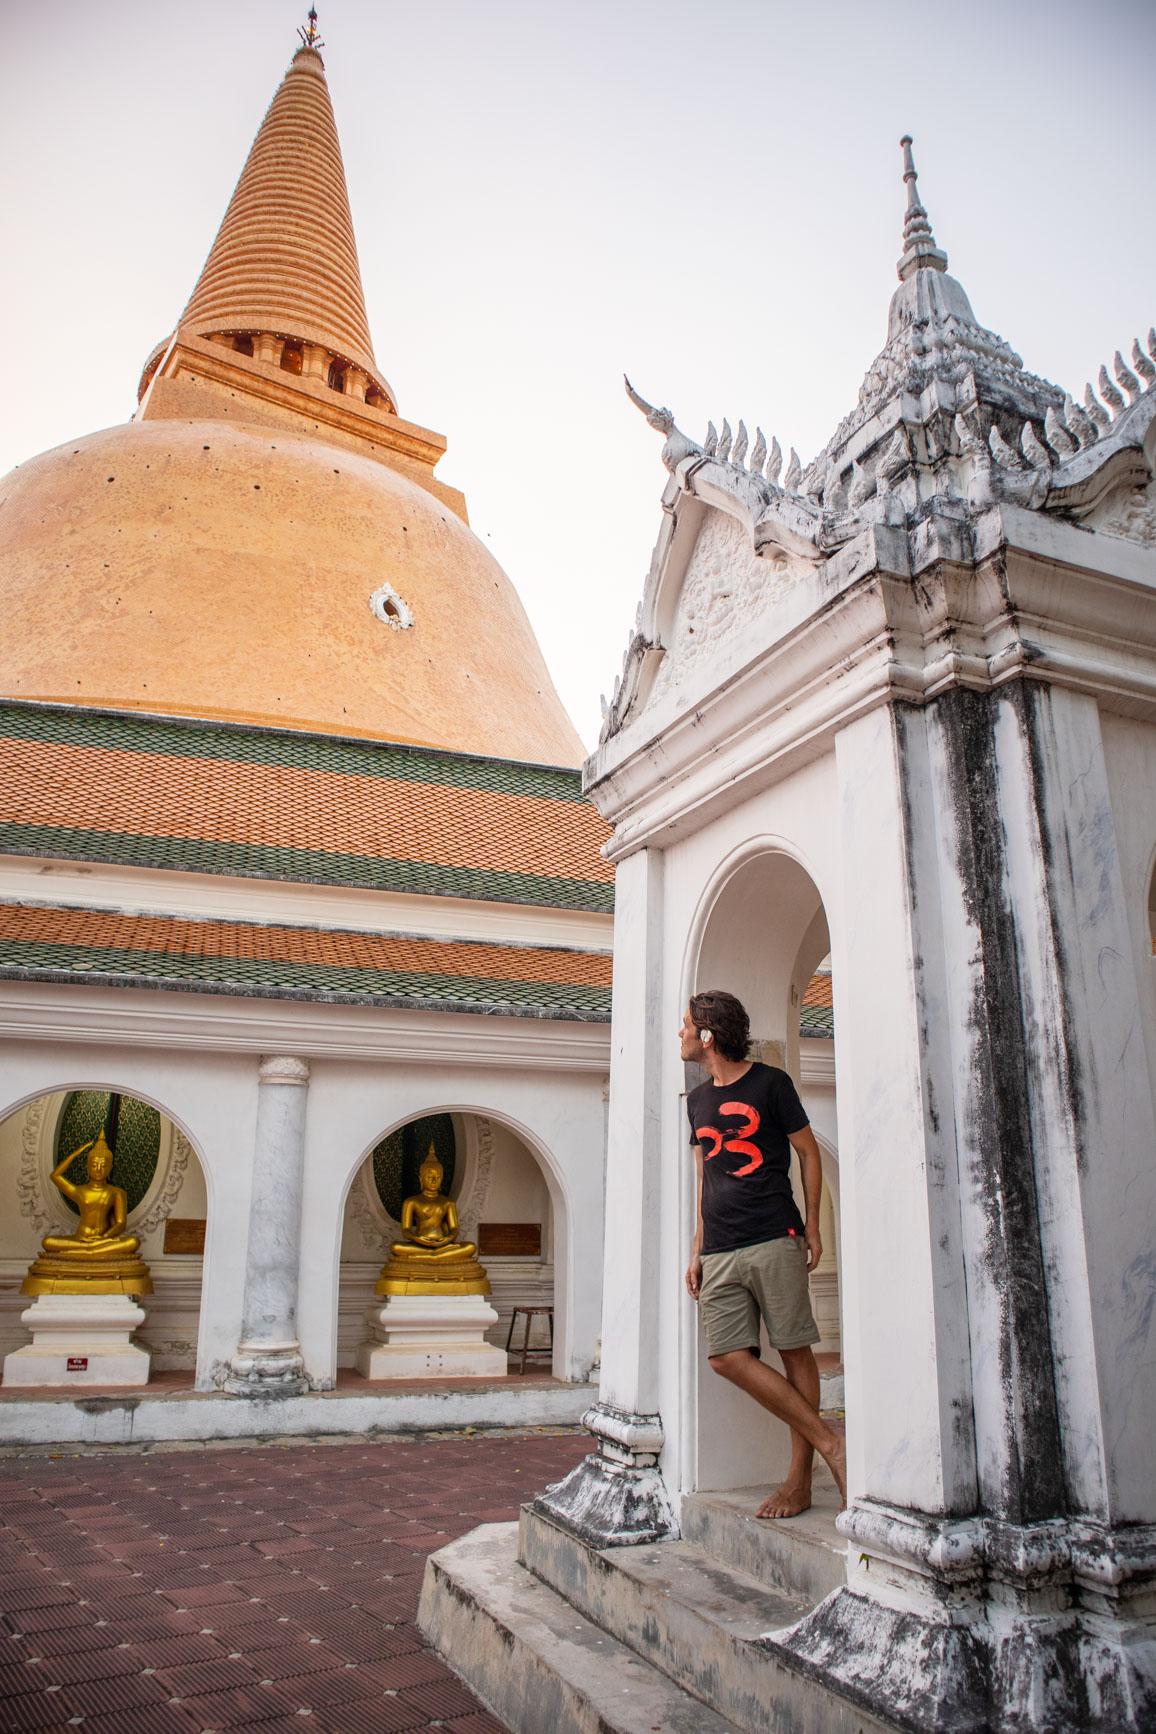 https://bubo.sk/uploads/galleries/5060/tomashornak_thajsko_img_0110.jpg